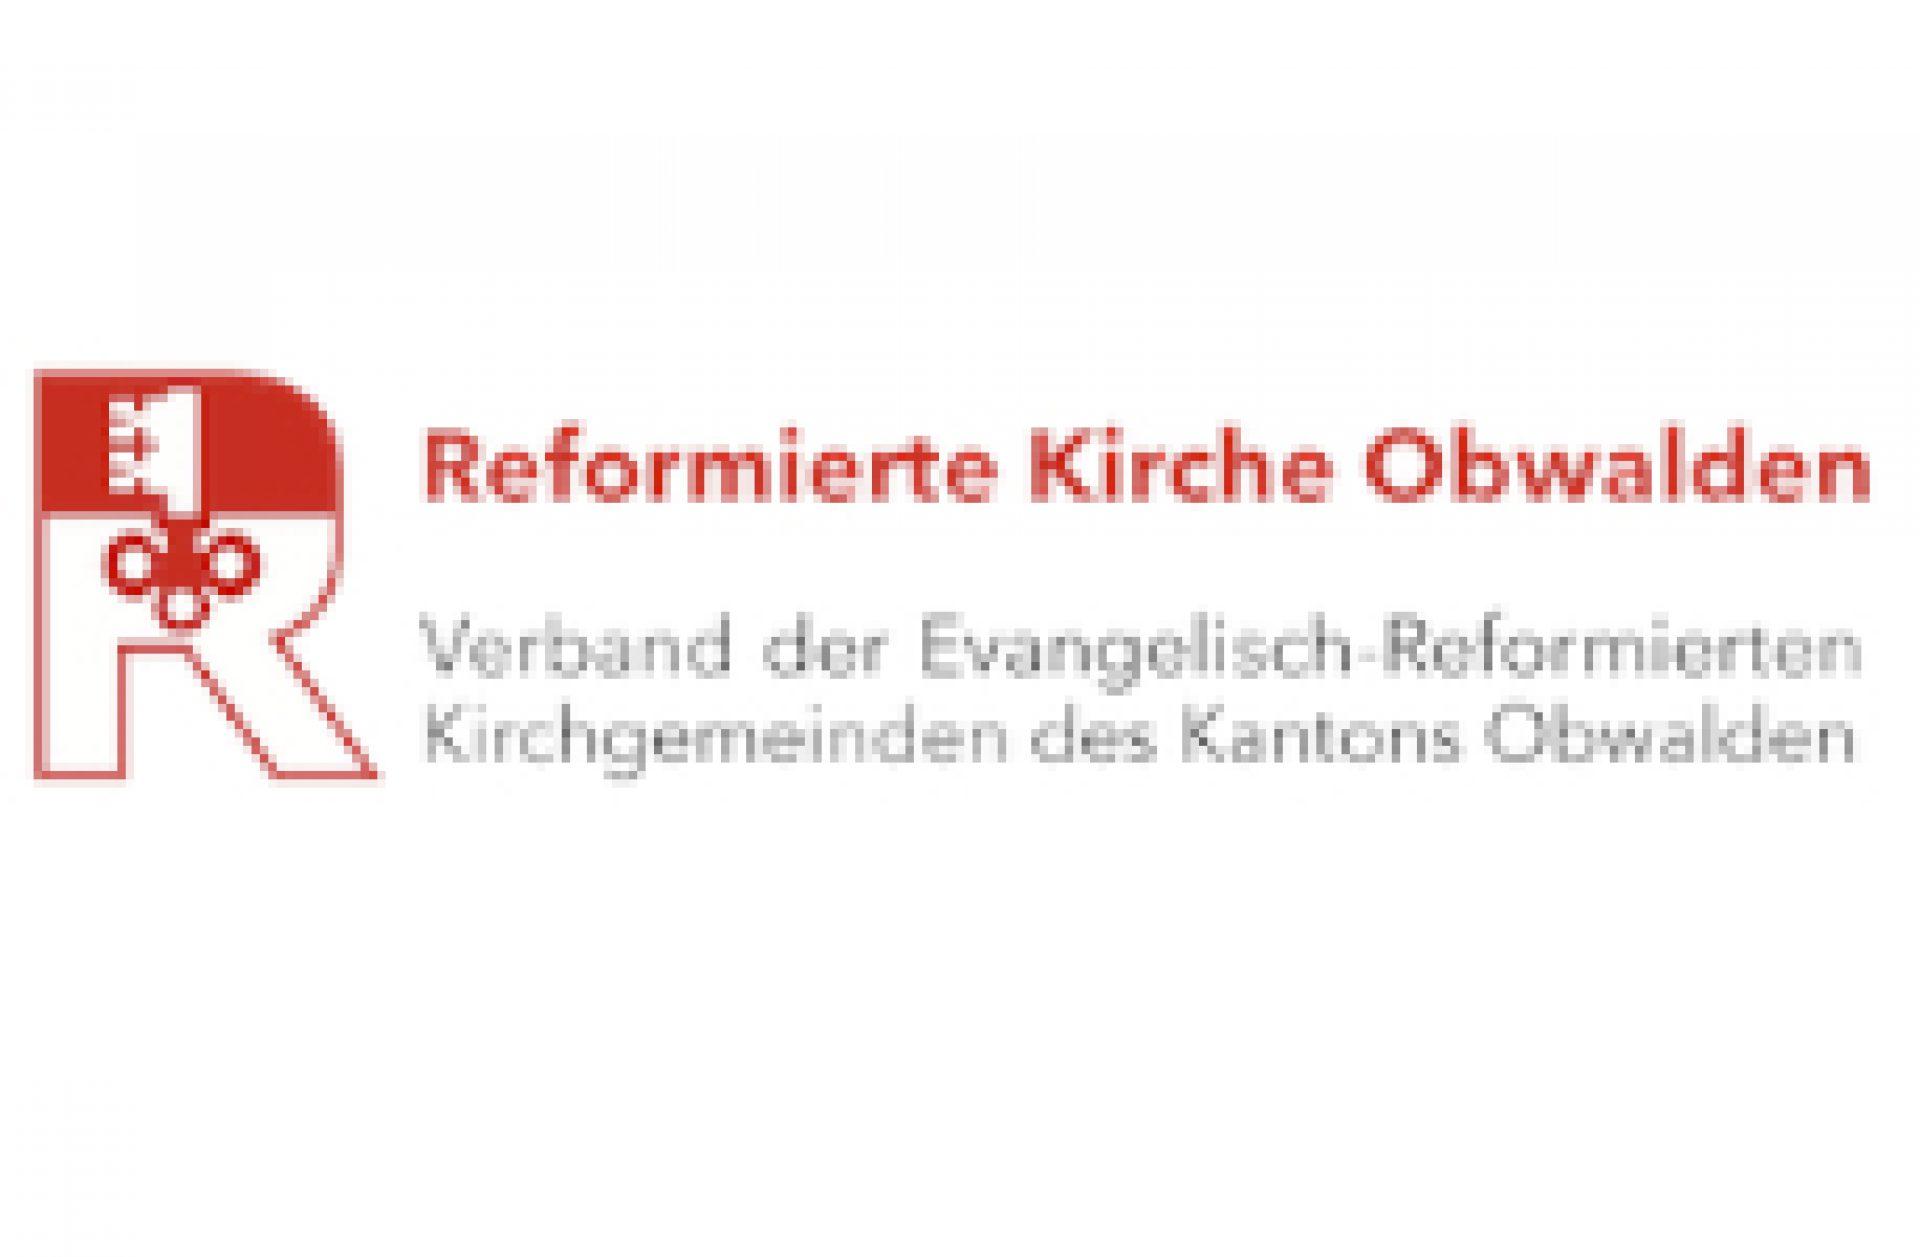 Reformierte Kirche Obwalden